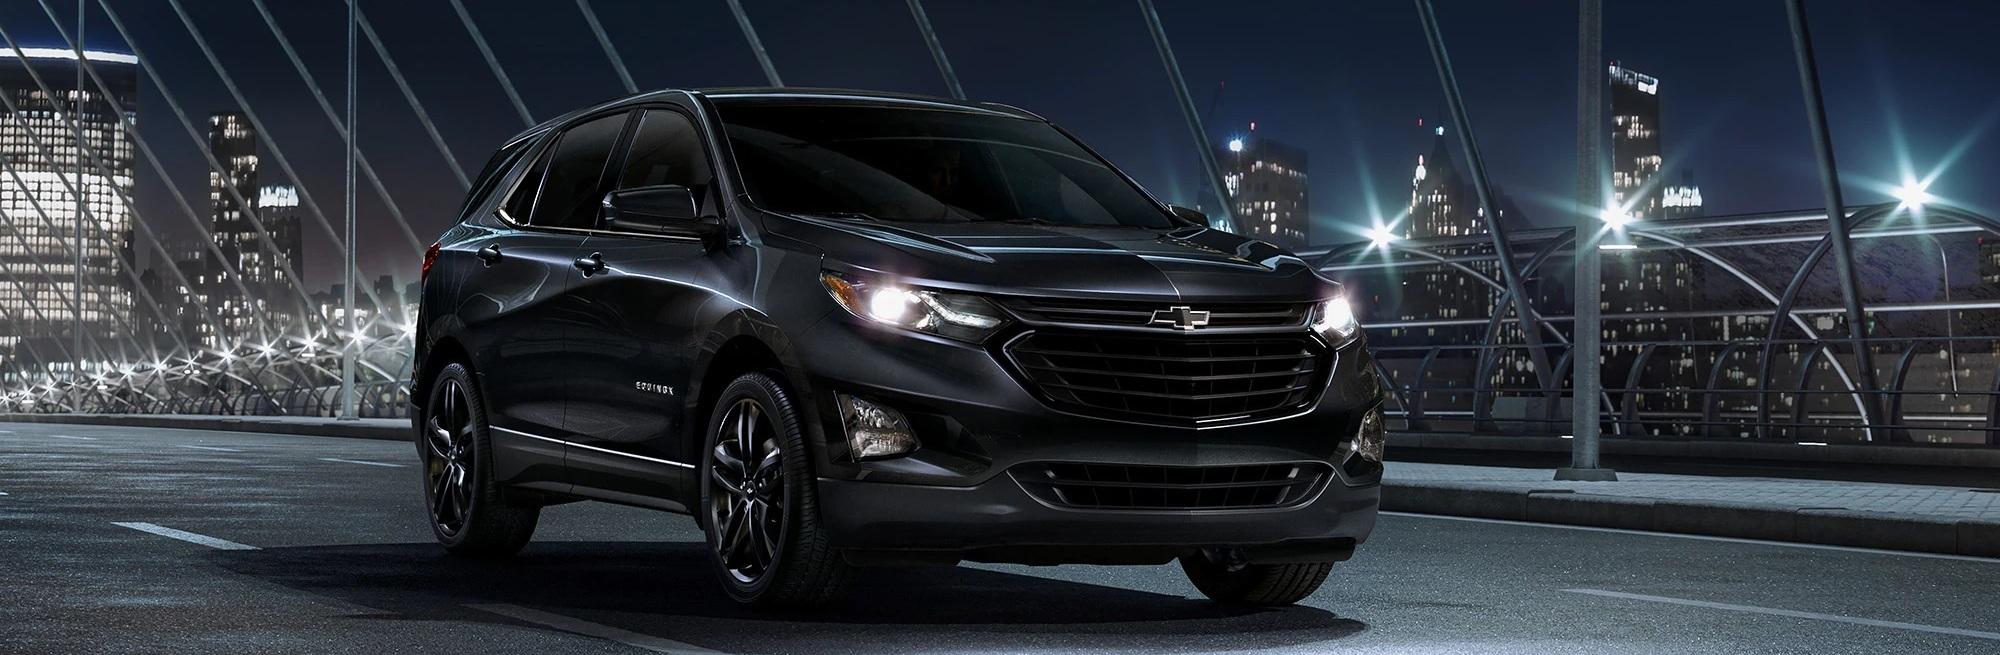 2020 Chevrolet Equinox for Sale near Fort Gratiot, MI